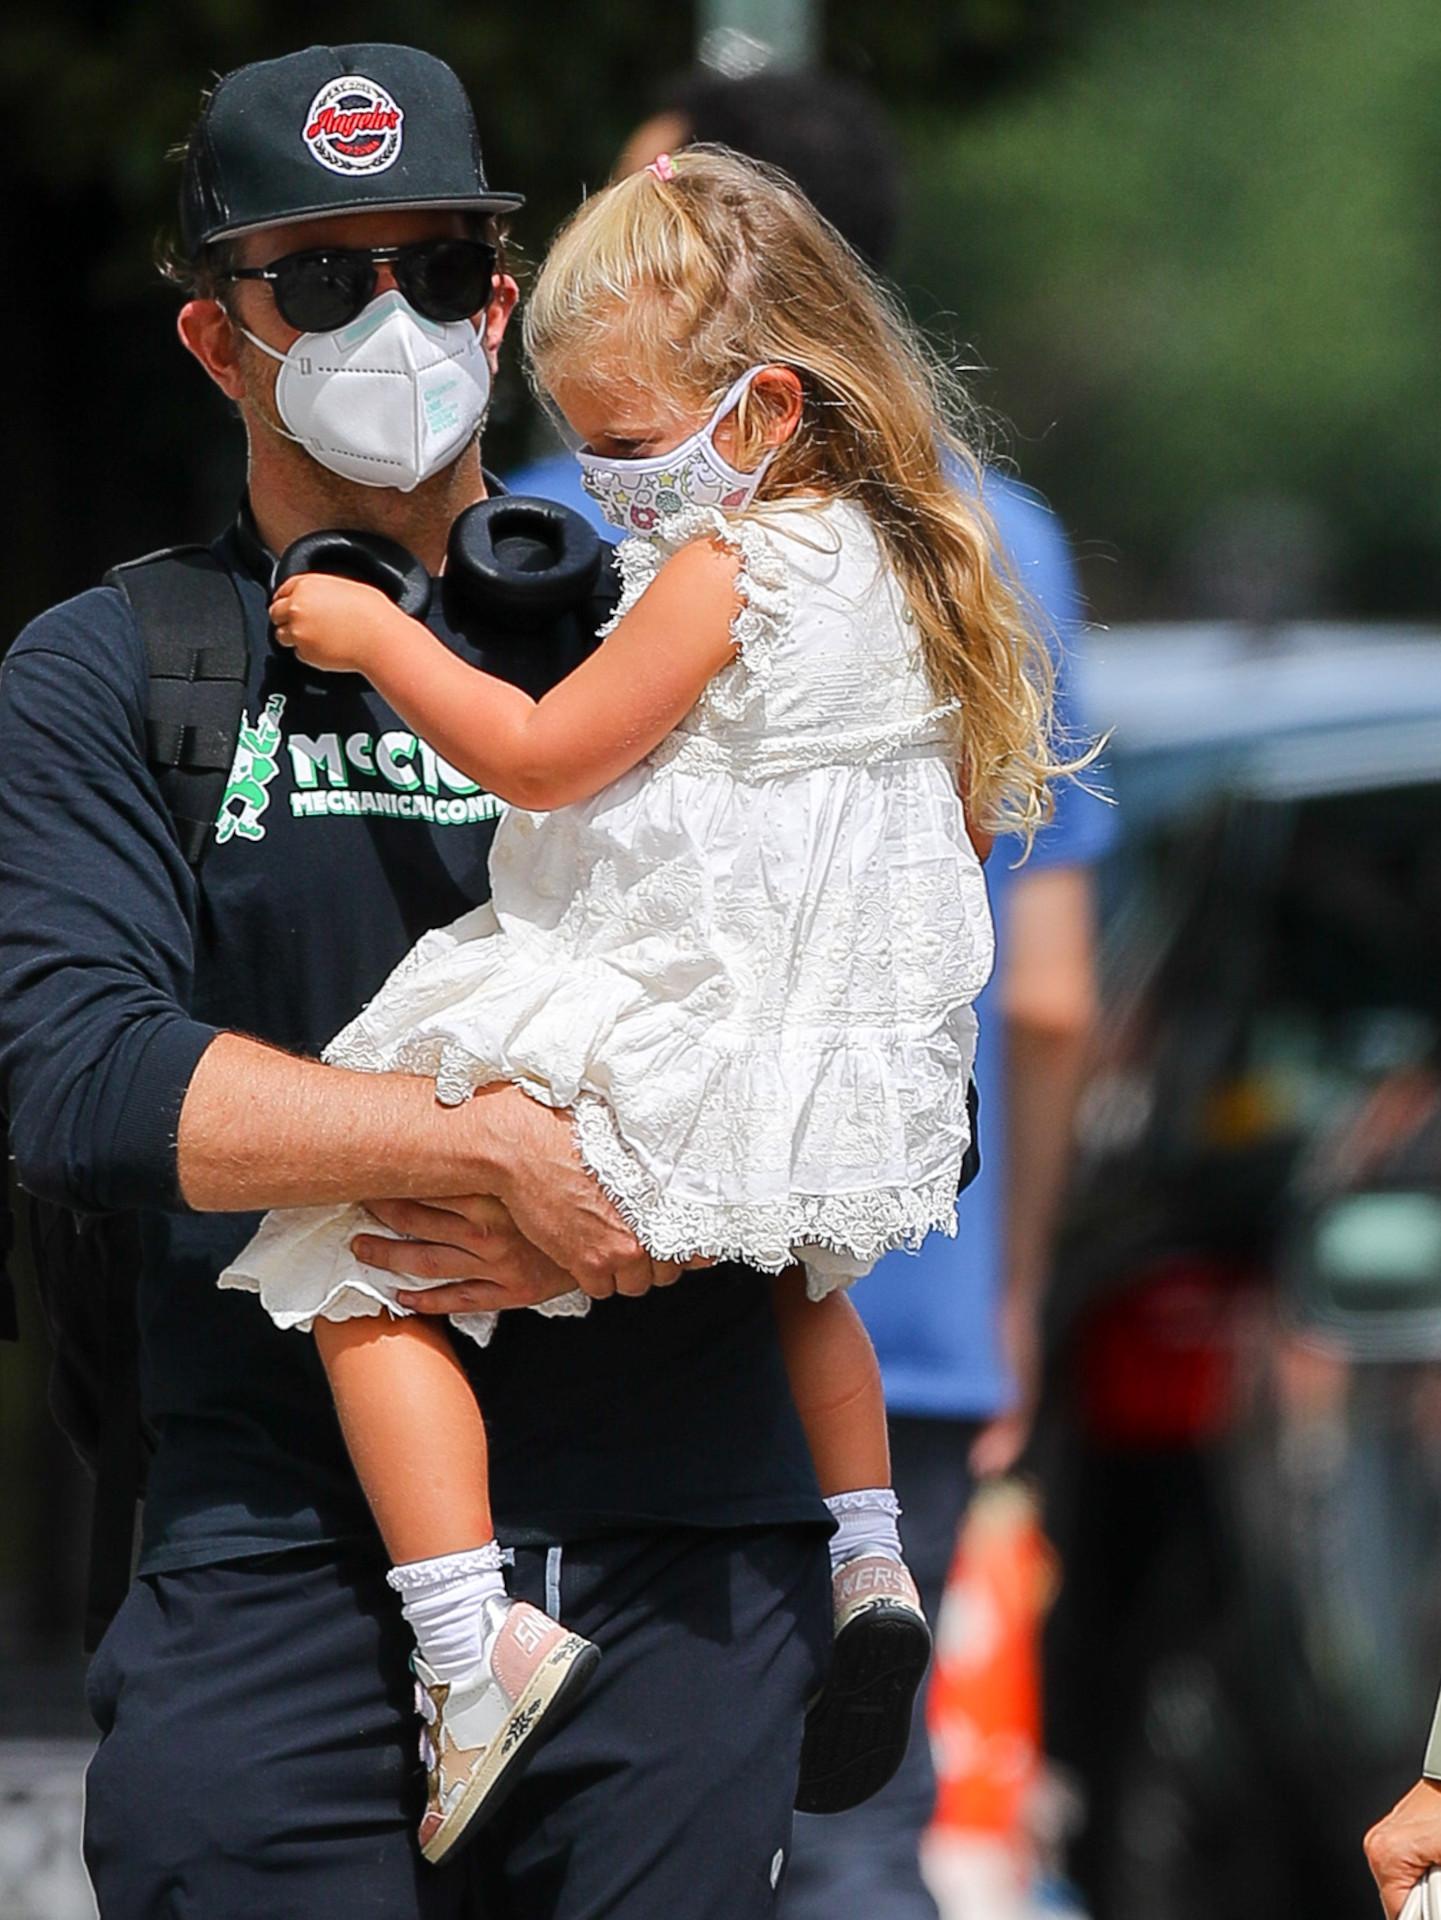 Bradley Cooper z córką, fot. Forum